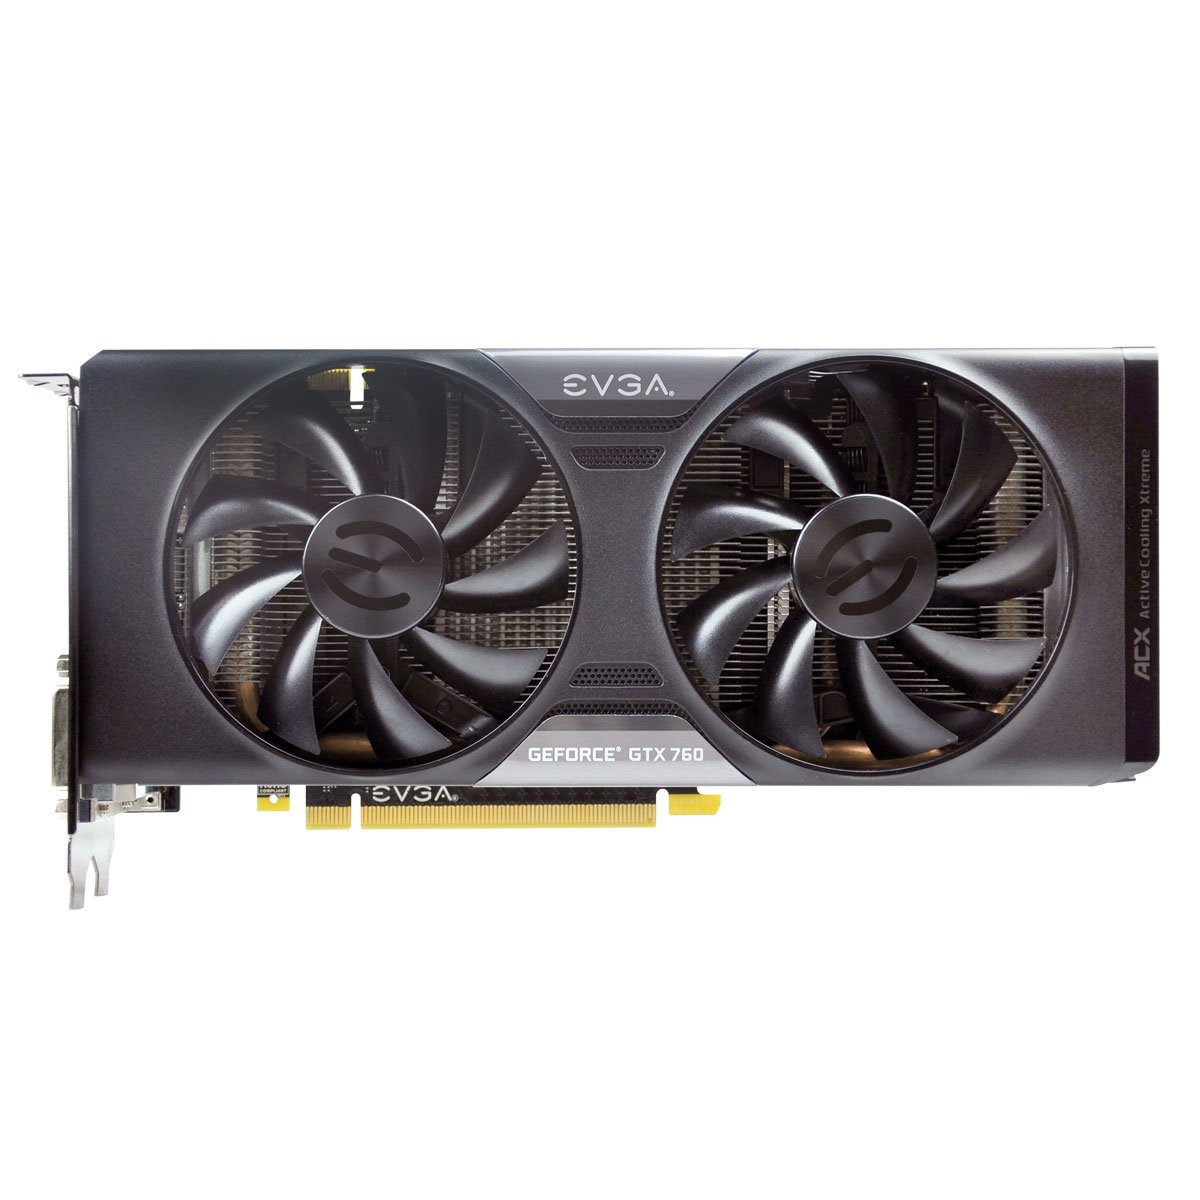 EVGA 04G-P4-2767-KR GeForce GTX 760 4GB GDDR5 - Tarjeta ...